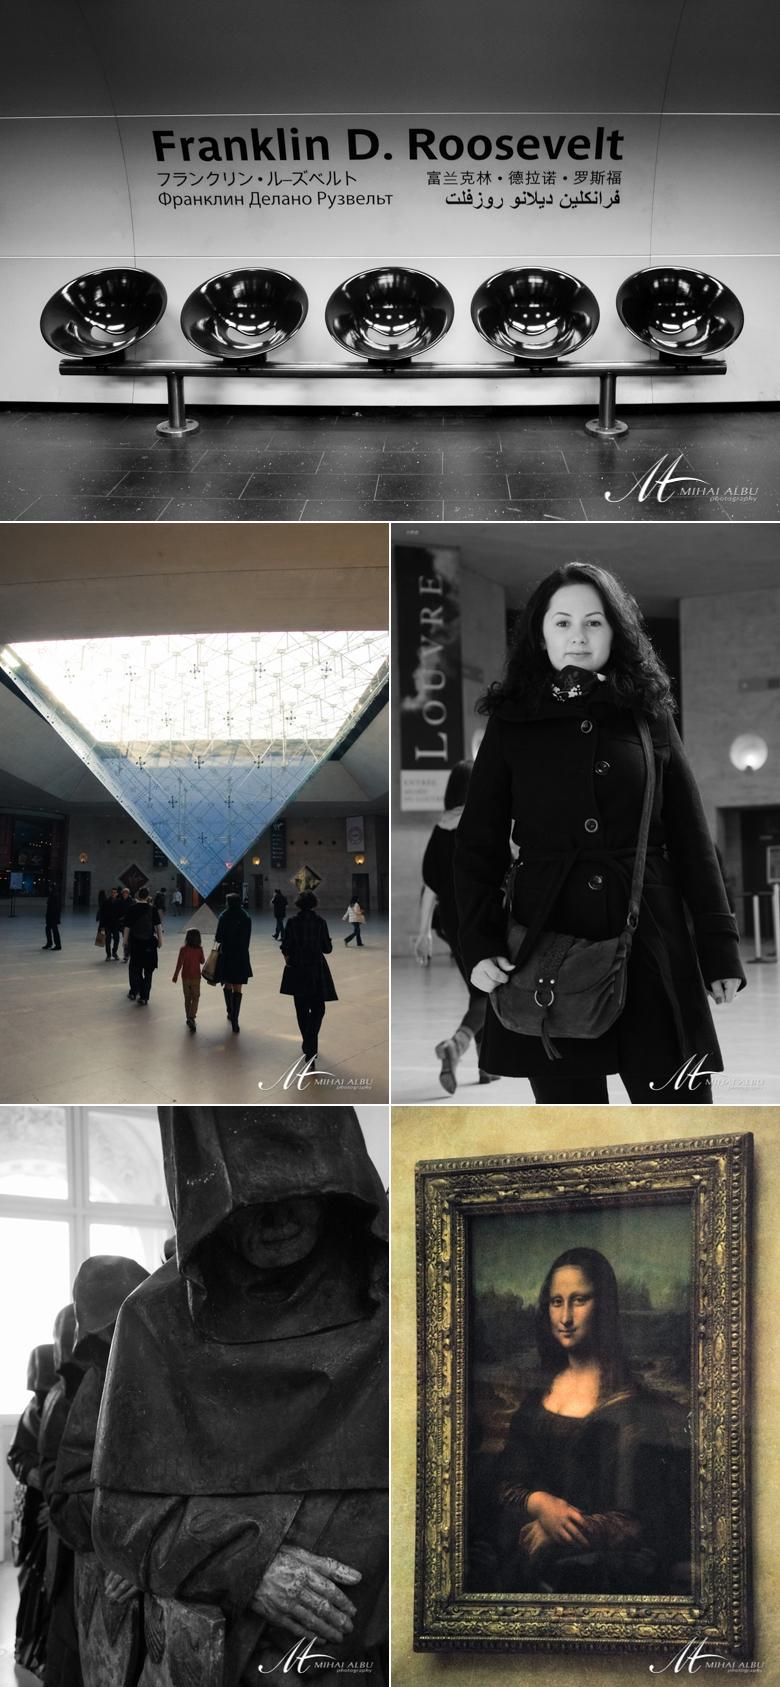 paris-poze-excursie-concediu-in-orasul-iubirii-turnul eiffel-muzeul-luvru 5